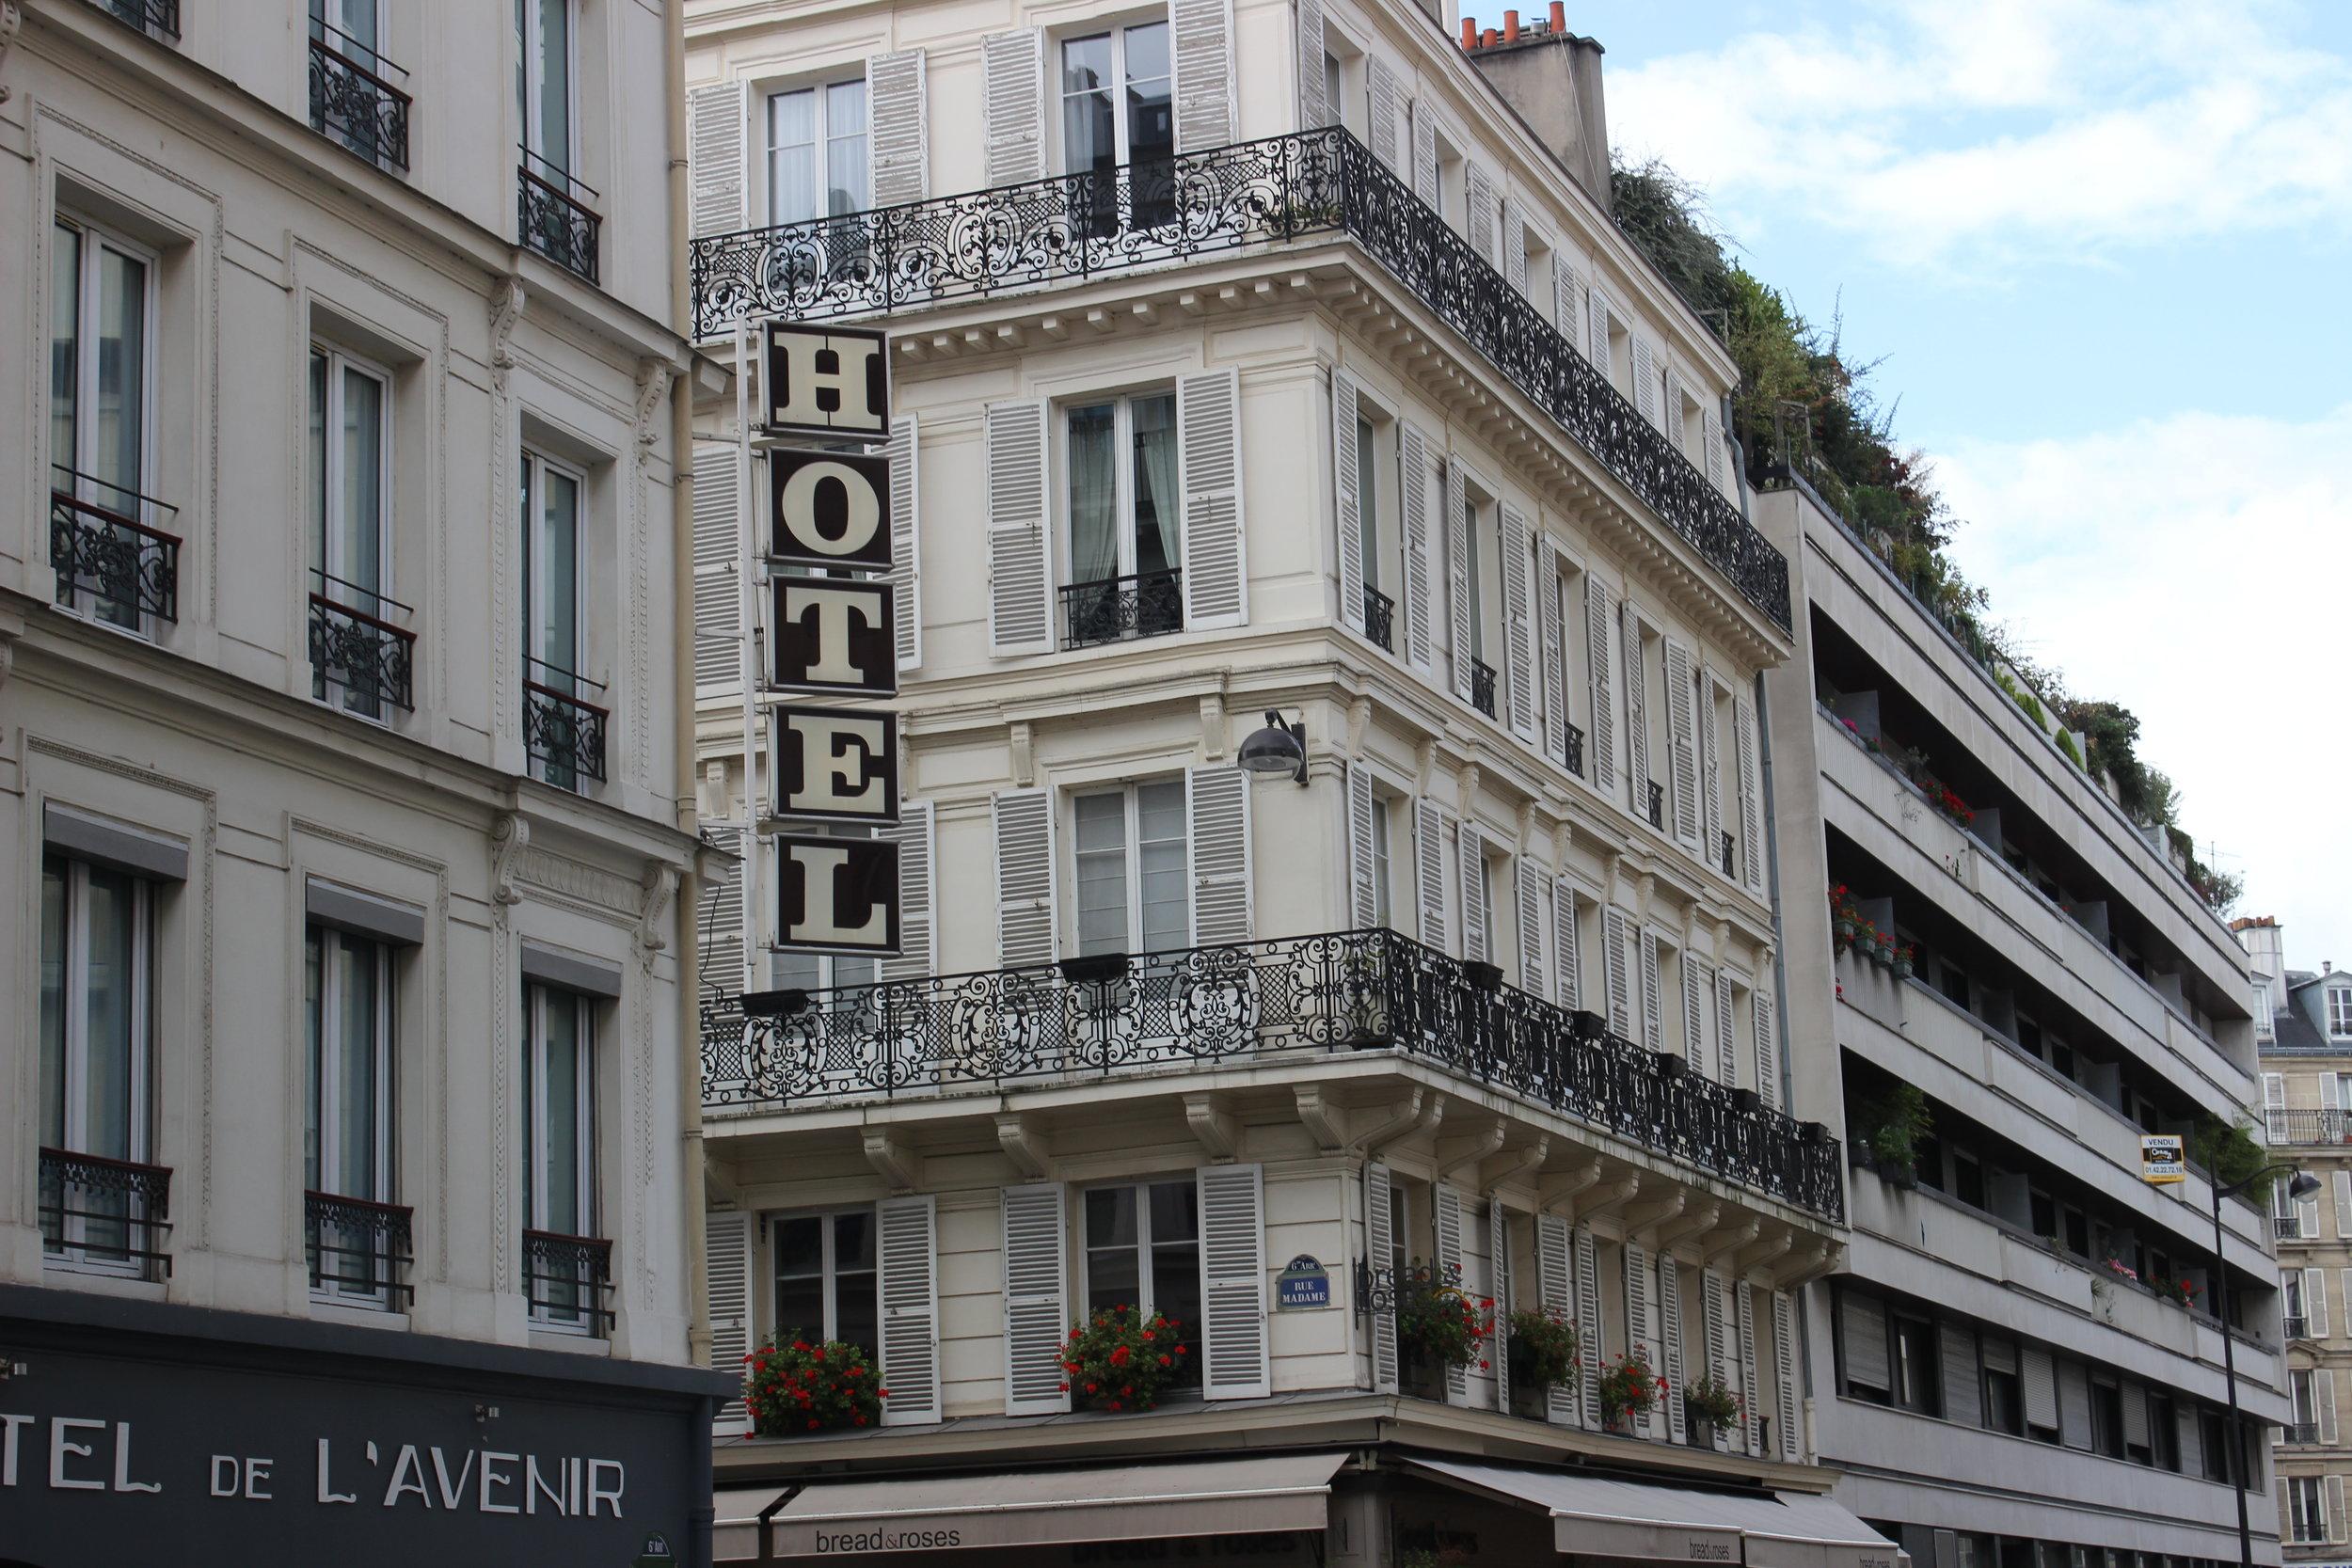 Paris Hotel - Chloe Fandetti